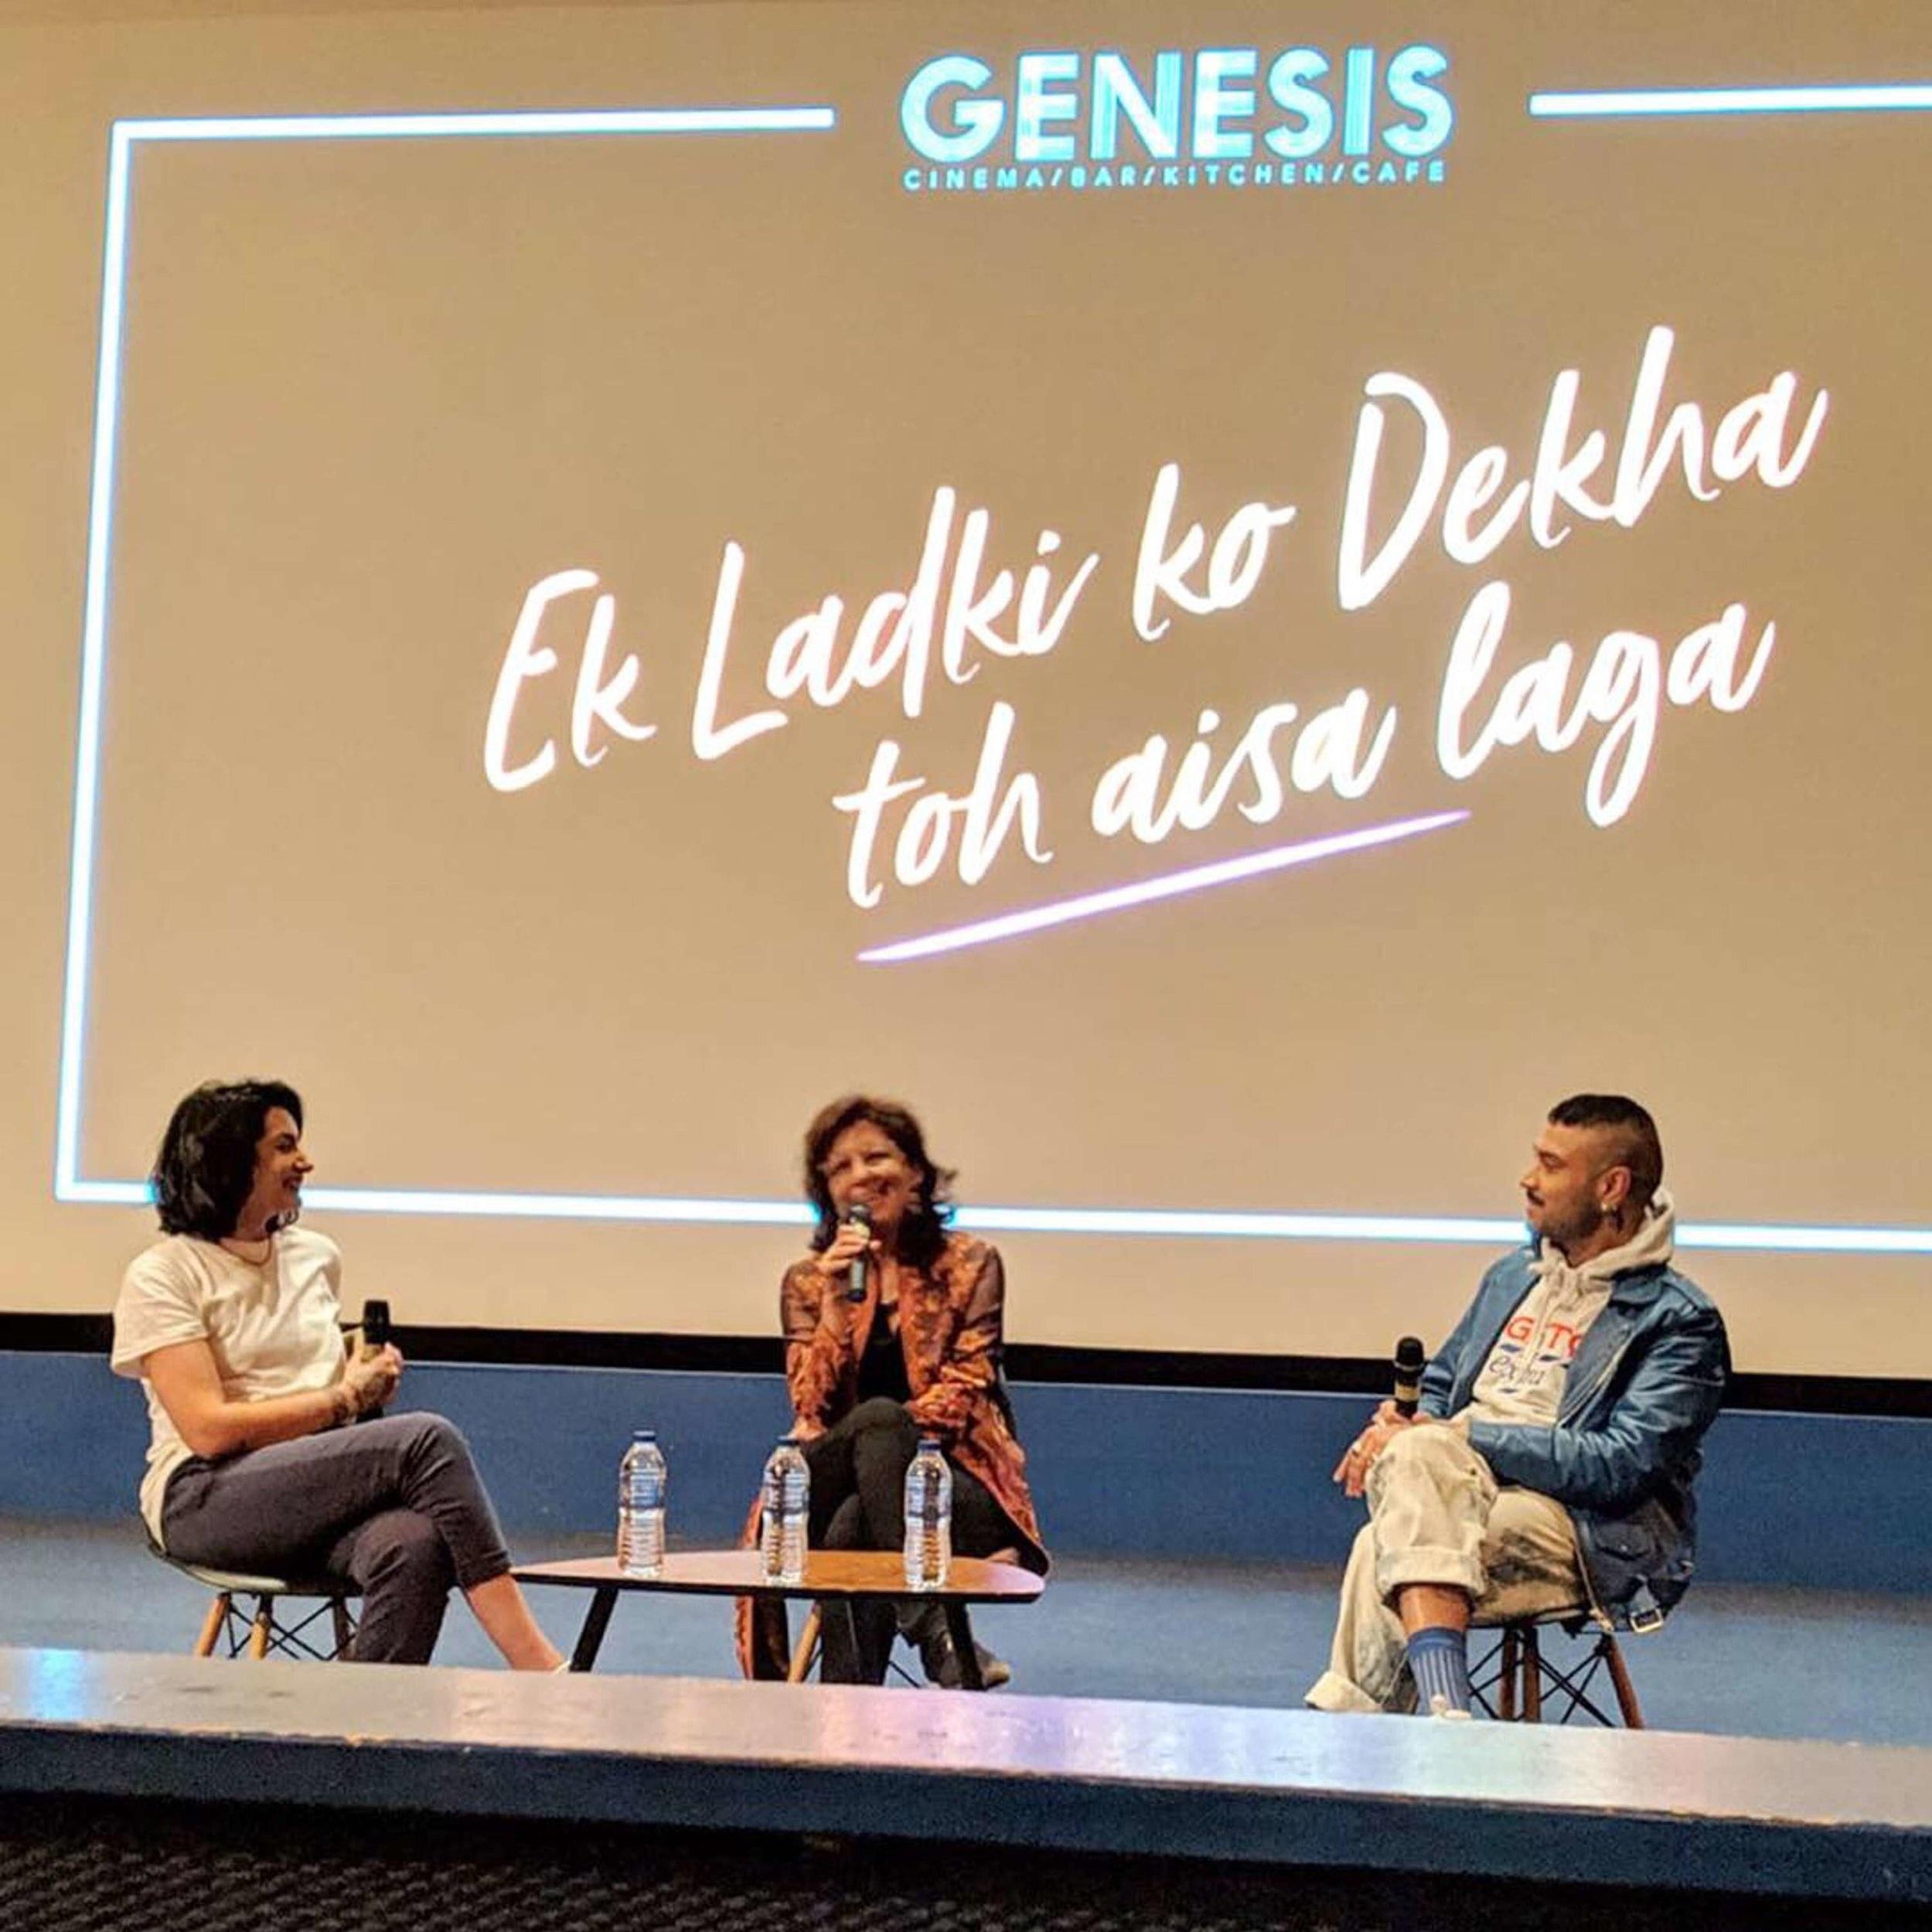 Q&A with director of Bollywood film Ek Ladki Ko Dekha Toh Aisa Laga - I co-hosted a Q&A with director Shelly Chopra Dhar of the first big Bollywood blockbuster that centres a lesbian romance.